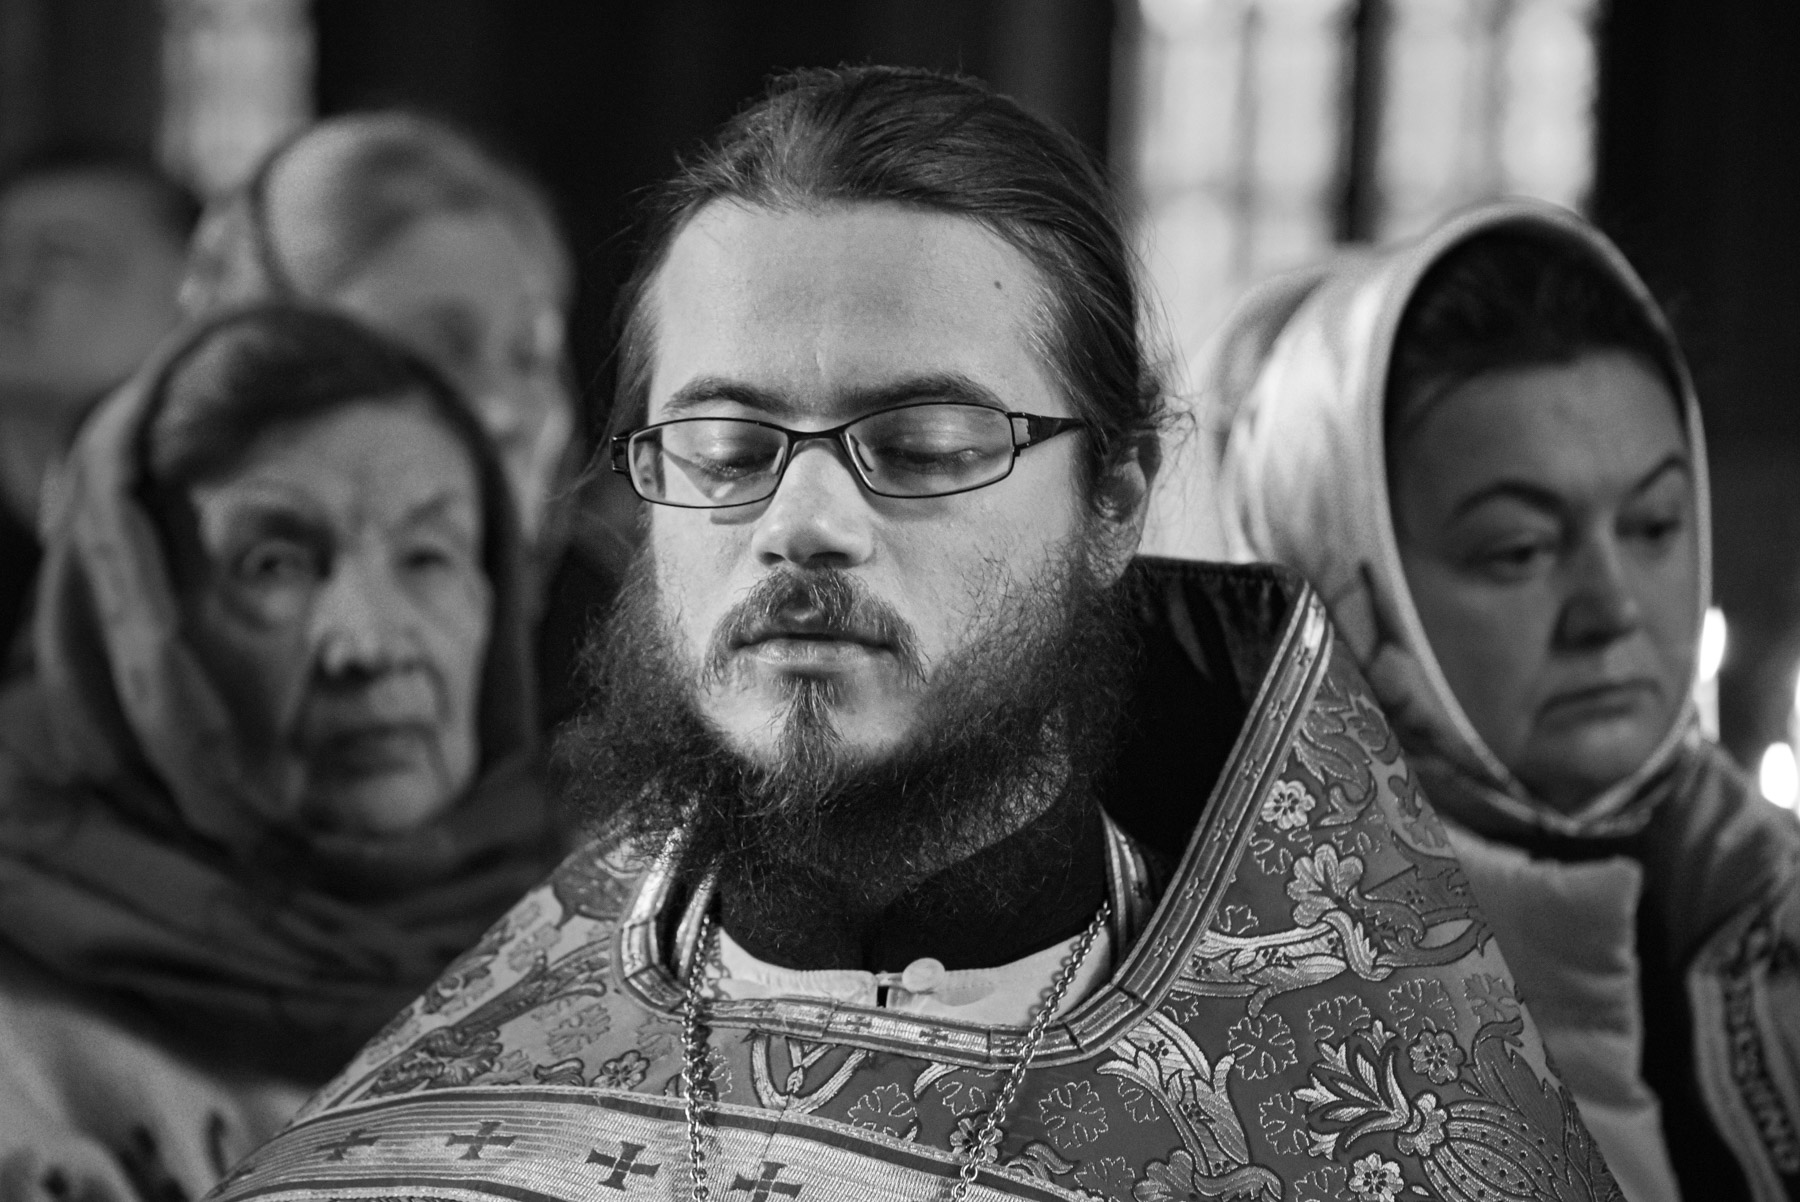 photos of orthodox christmas 0076 2